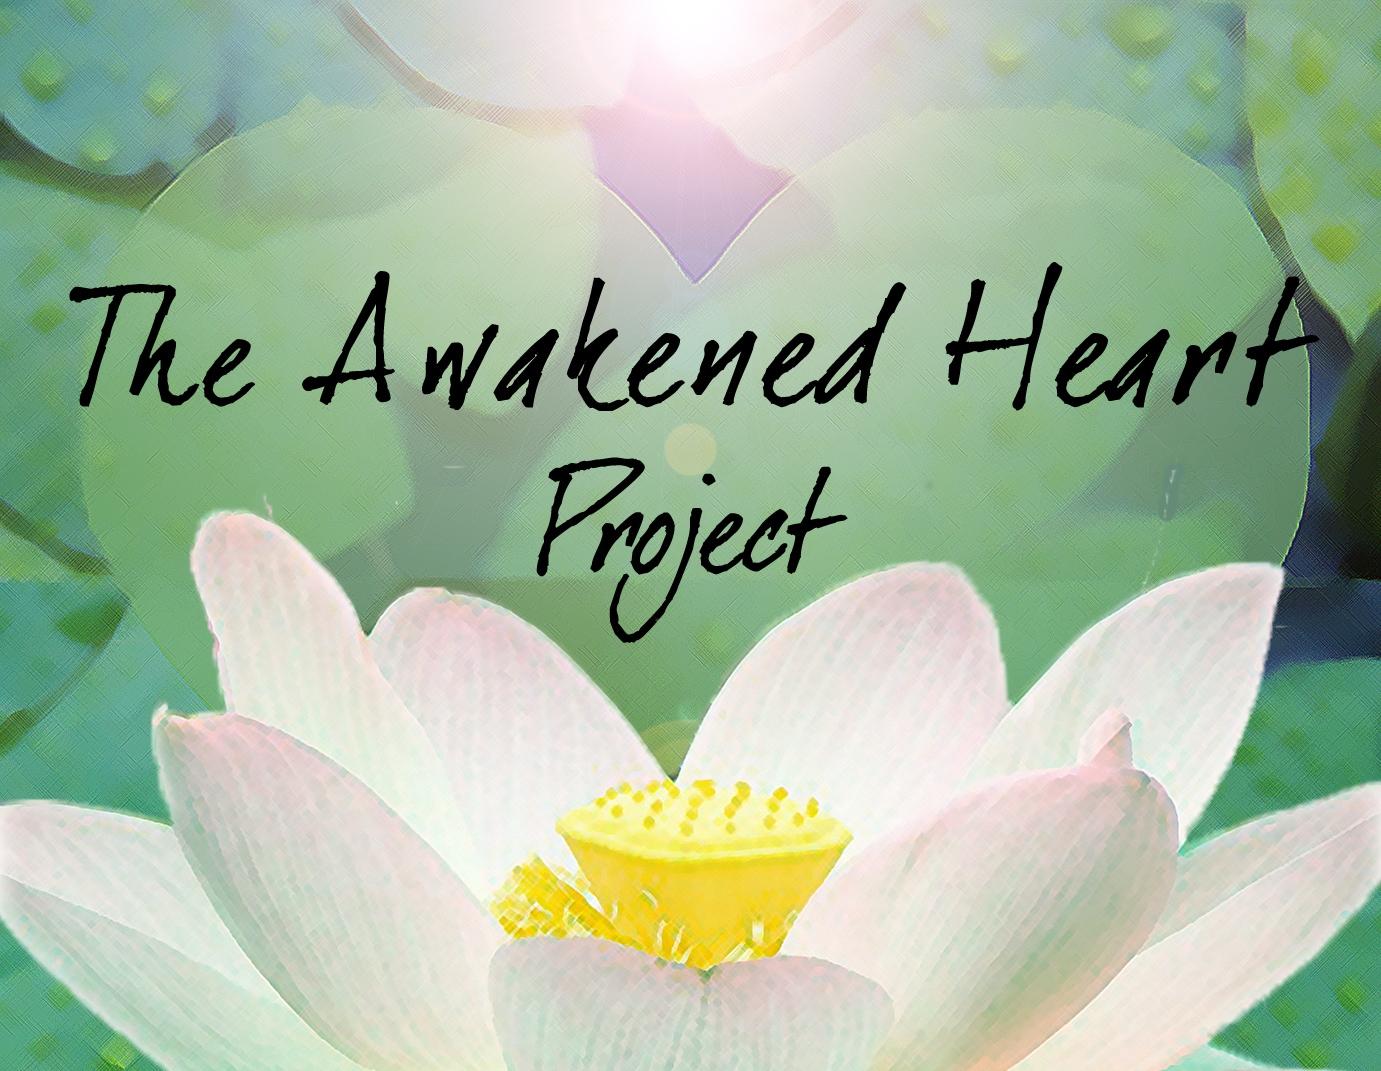 the-awakened-heart-project-widget